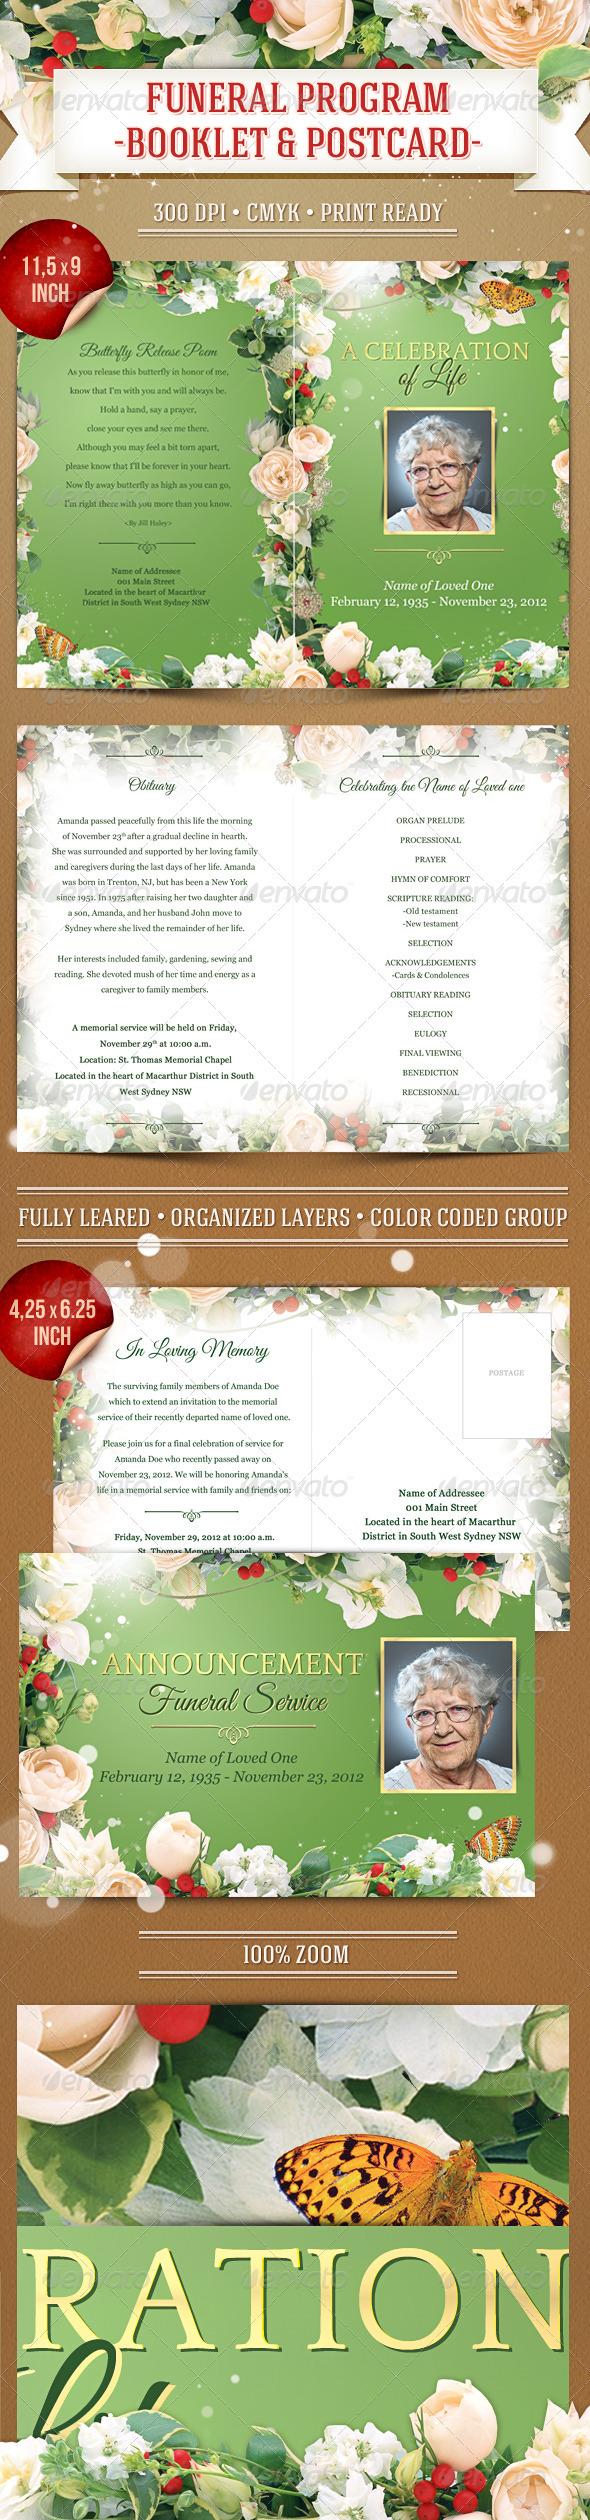 GraphicRiver Funeral Program Template Booklet & Postcard 3656880